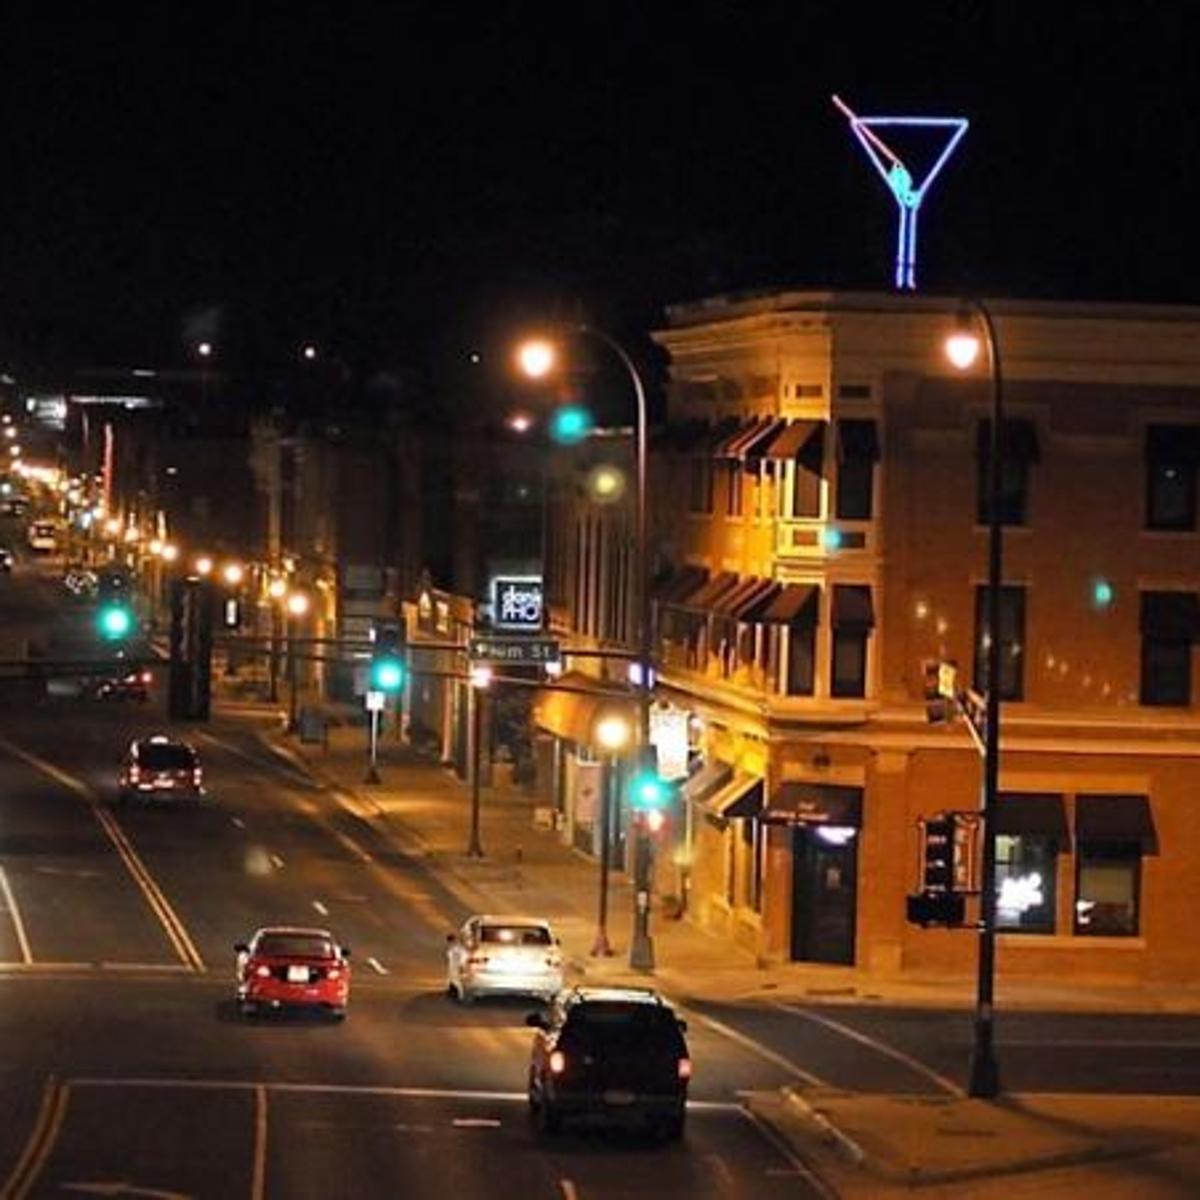 Rooftop martini glass shakes up city | Local News | mankatofreepress com